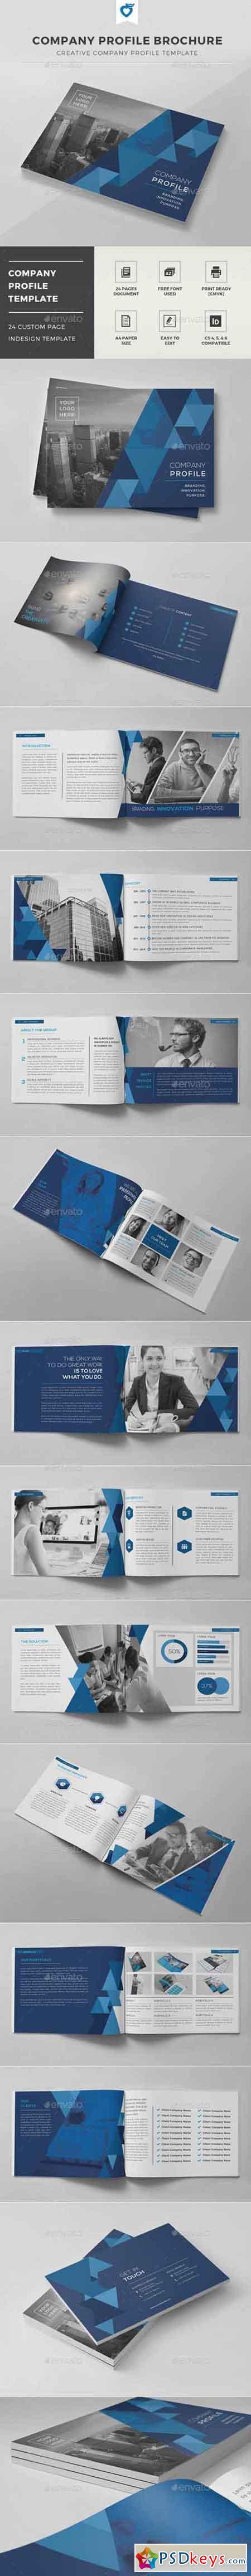 Company Profile Brochure 11808076 » Free Download Photoshop Vector ...